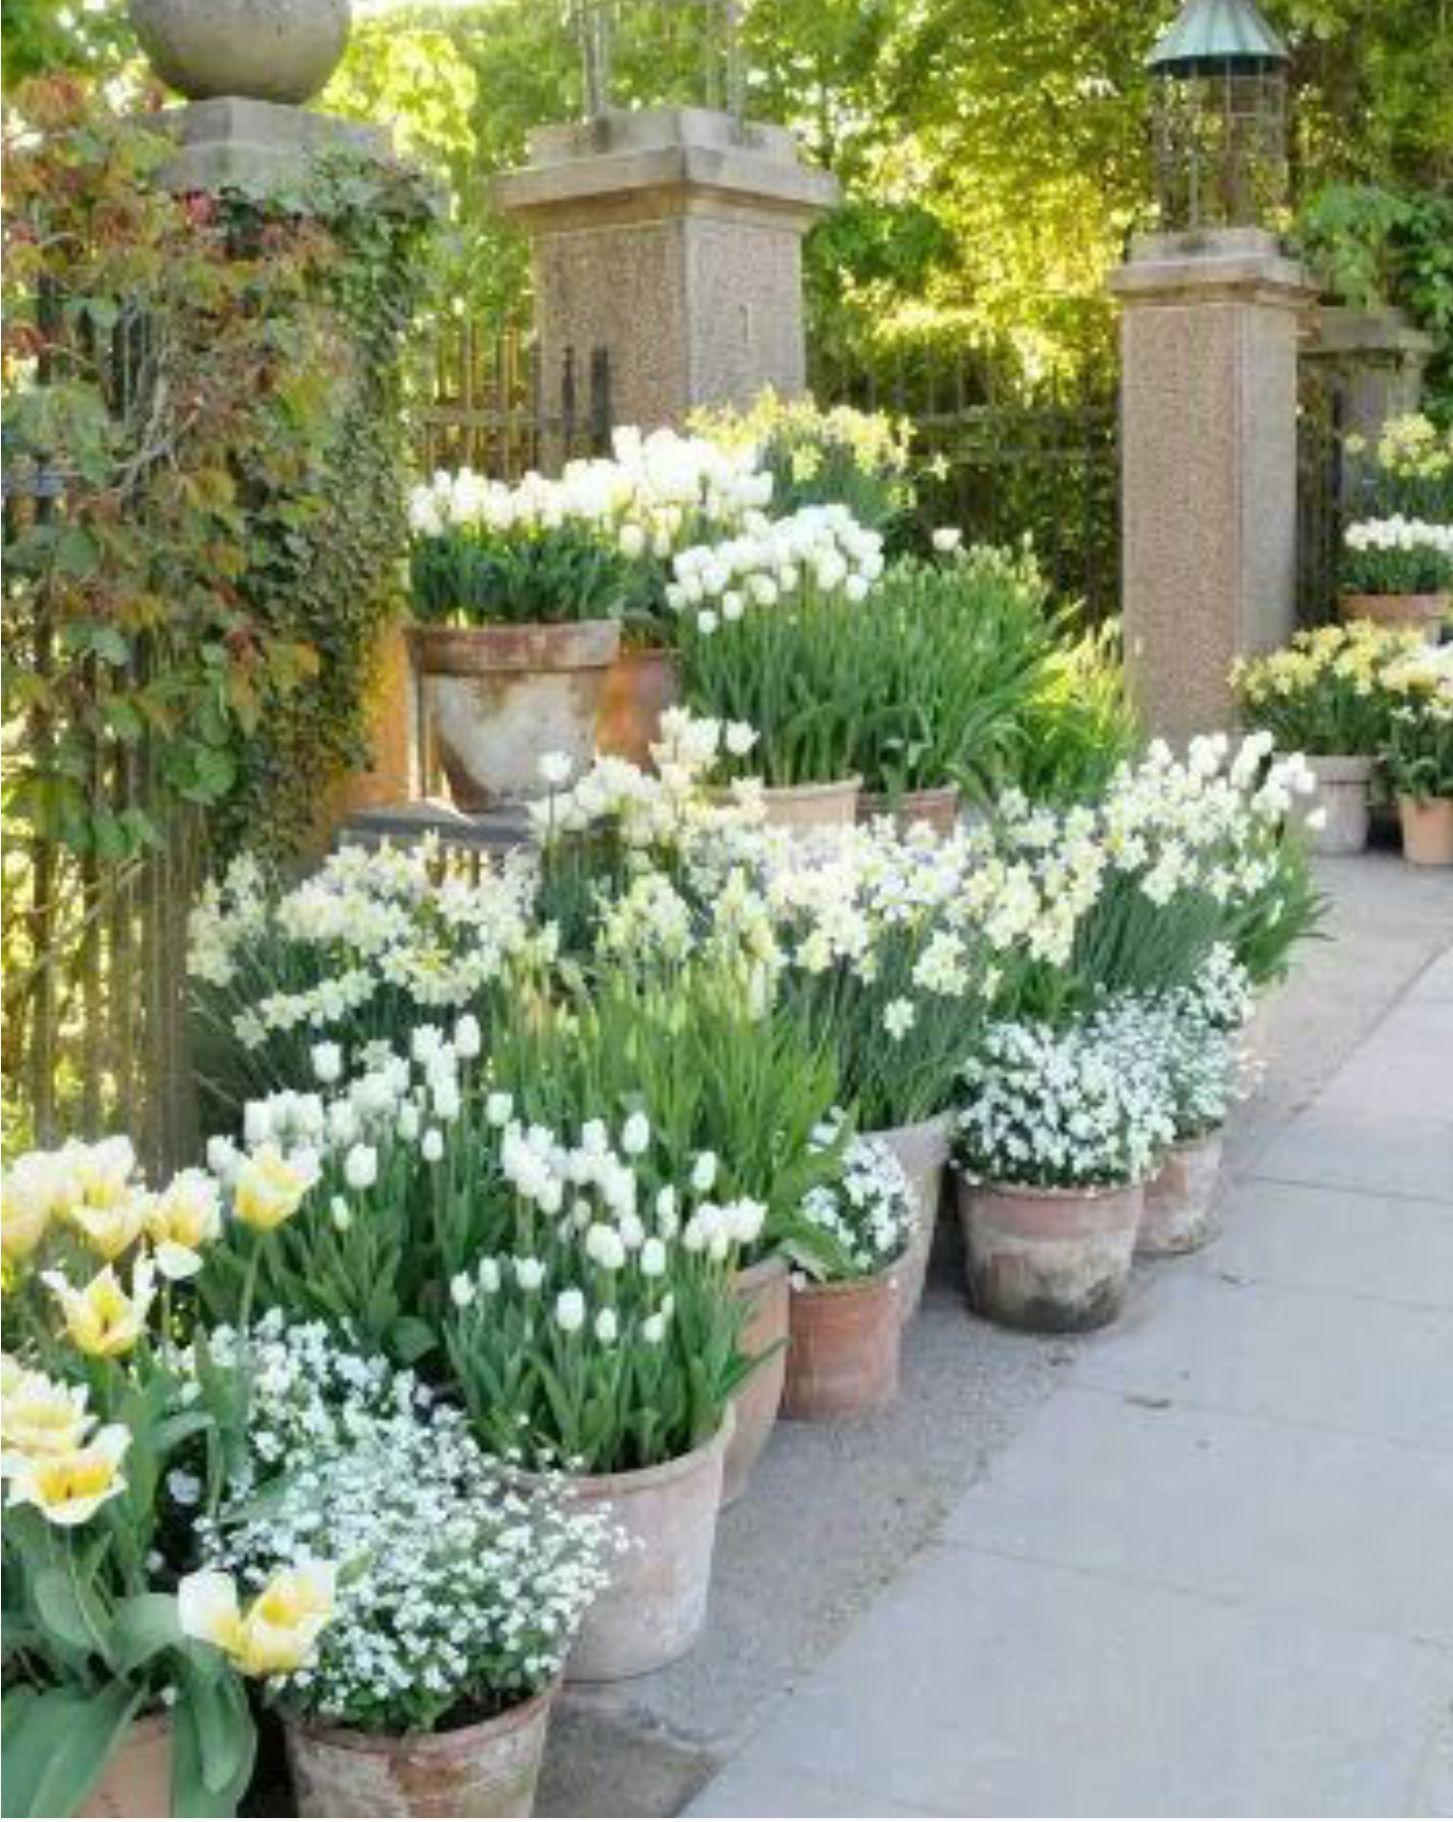 Pingl par cathie herrmann sur jardin cr er son jardin jardins et pot jardin - Creer son jardin ...